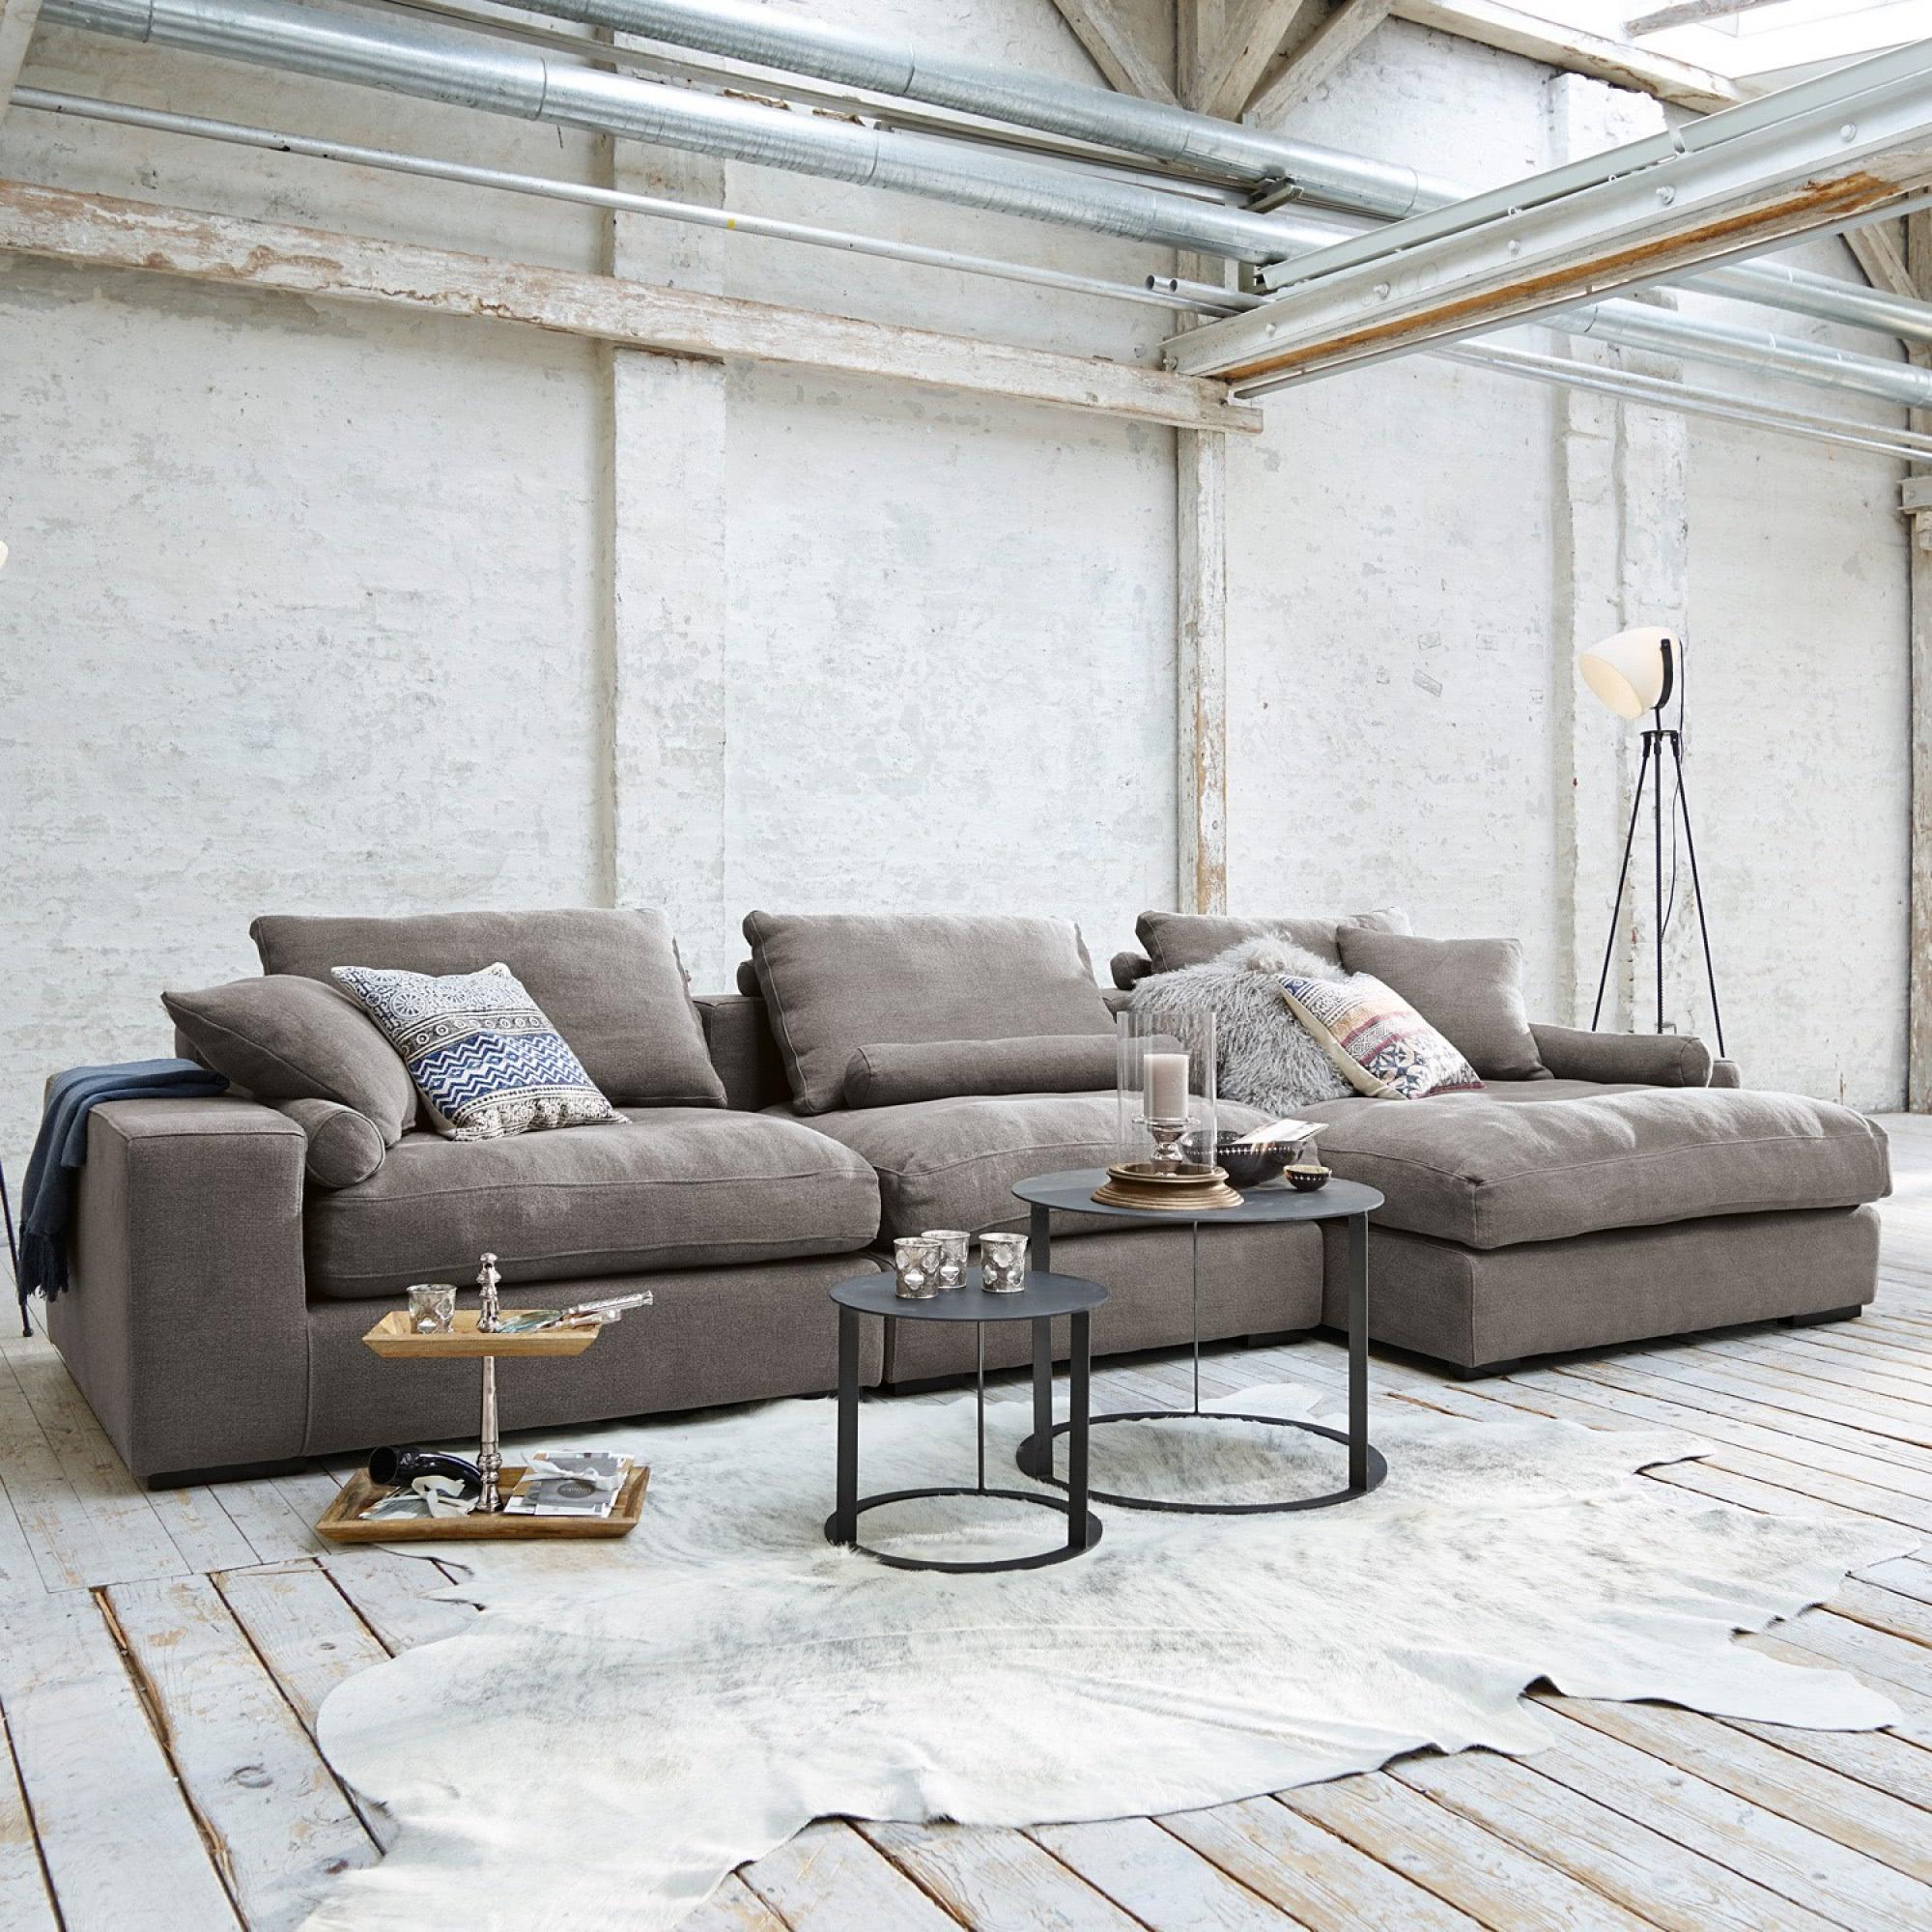 vintage möbel in antik-optik & zeitlosem design bei loberon - 33 Traditionelle Bett Designs Klassisch